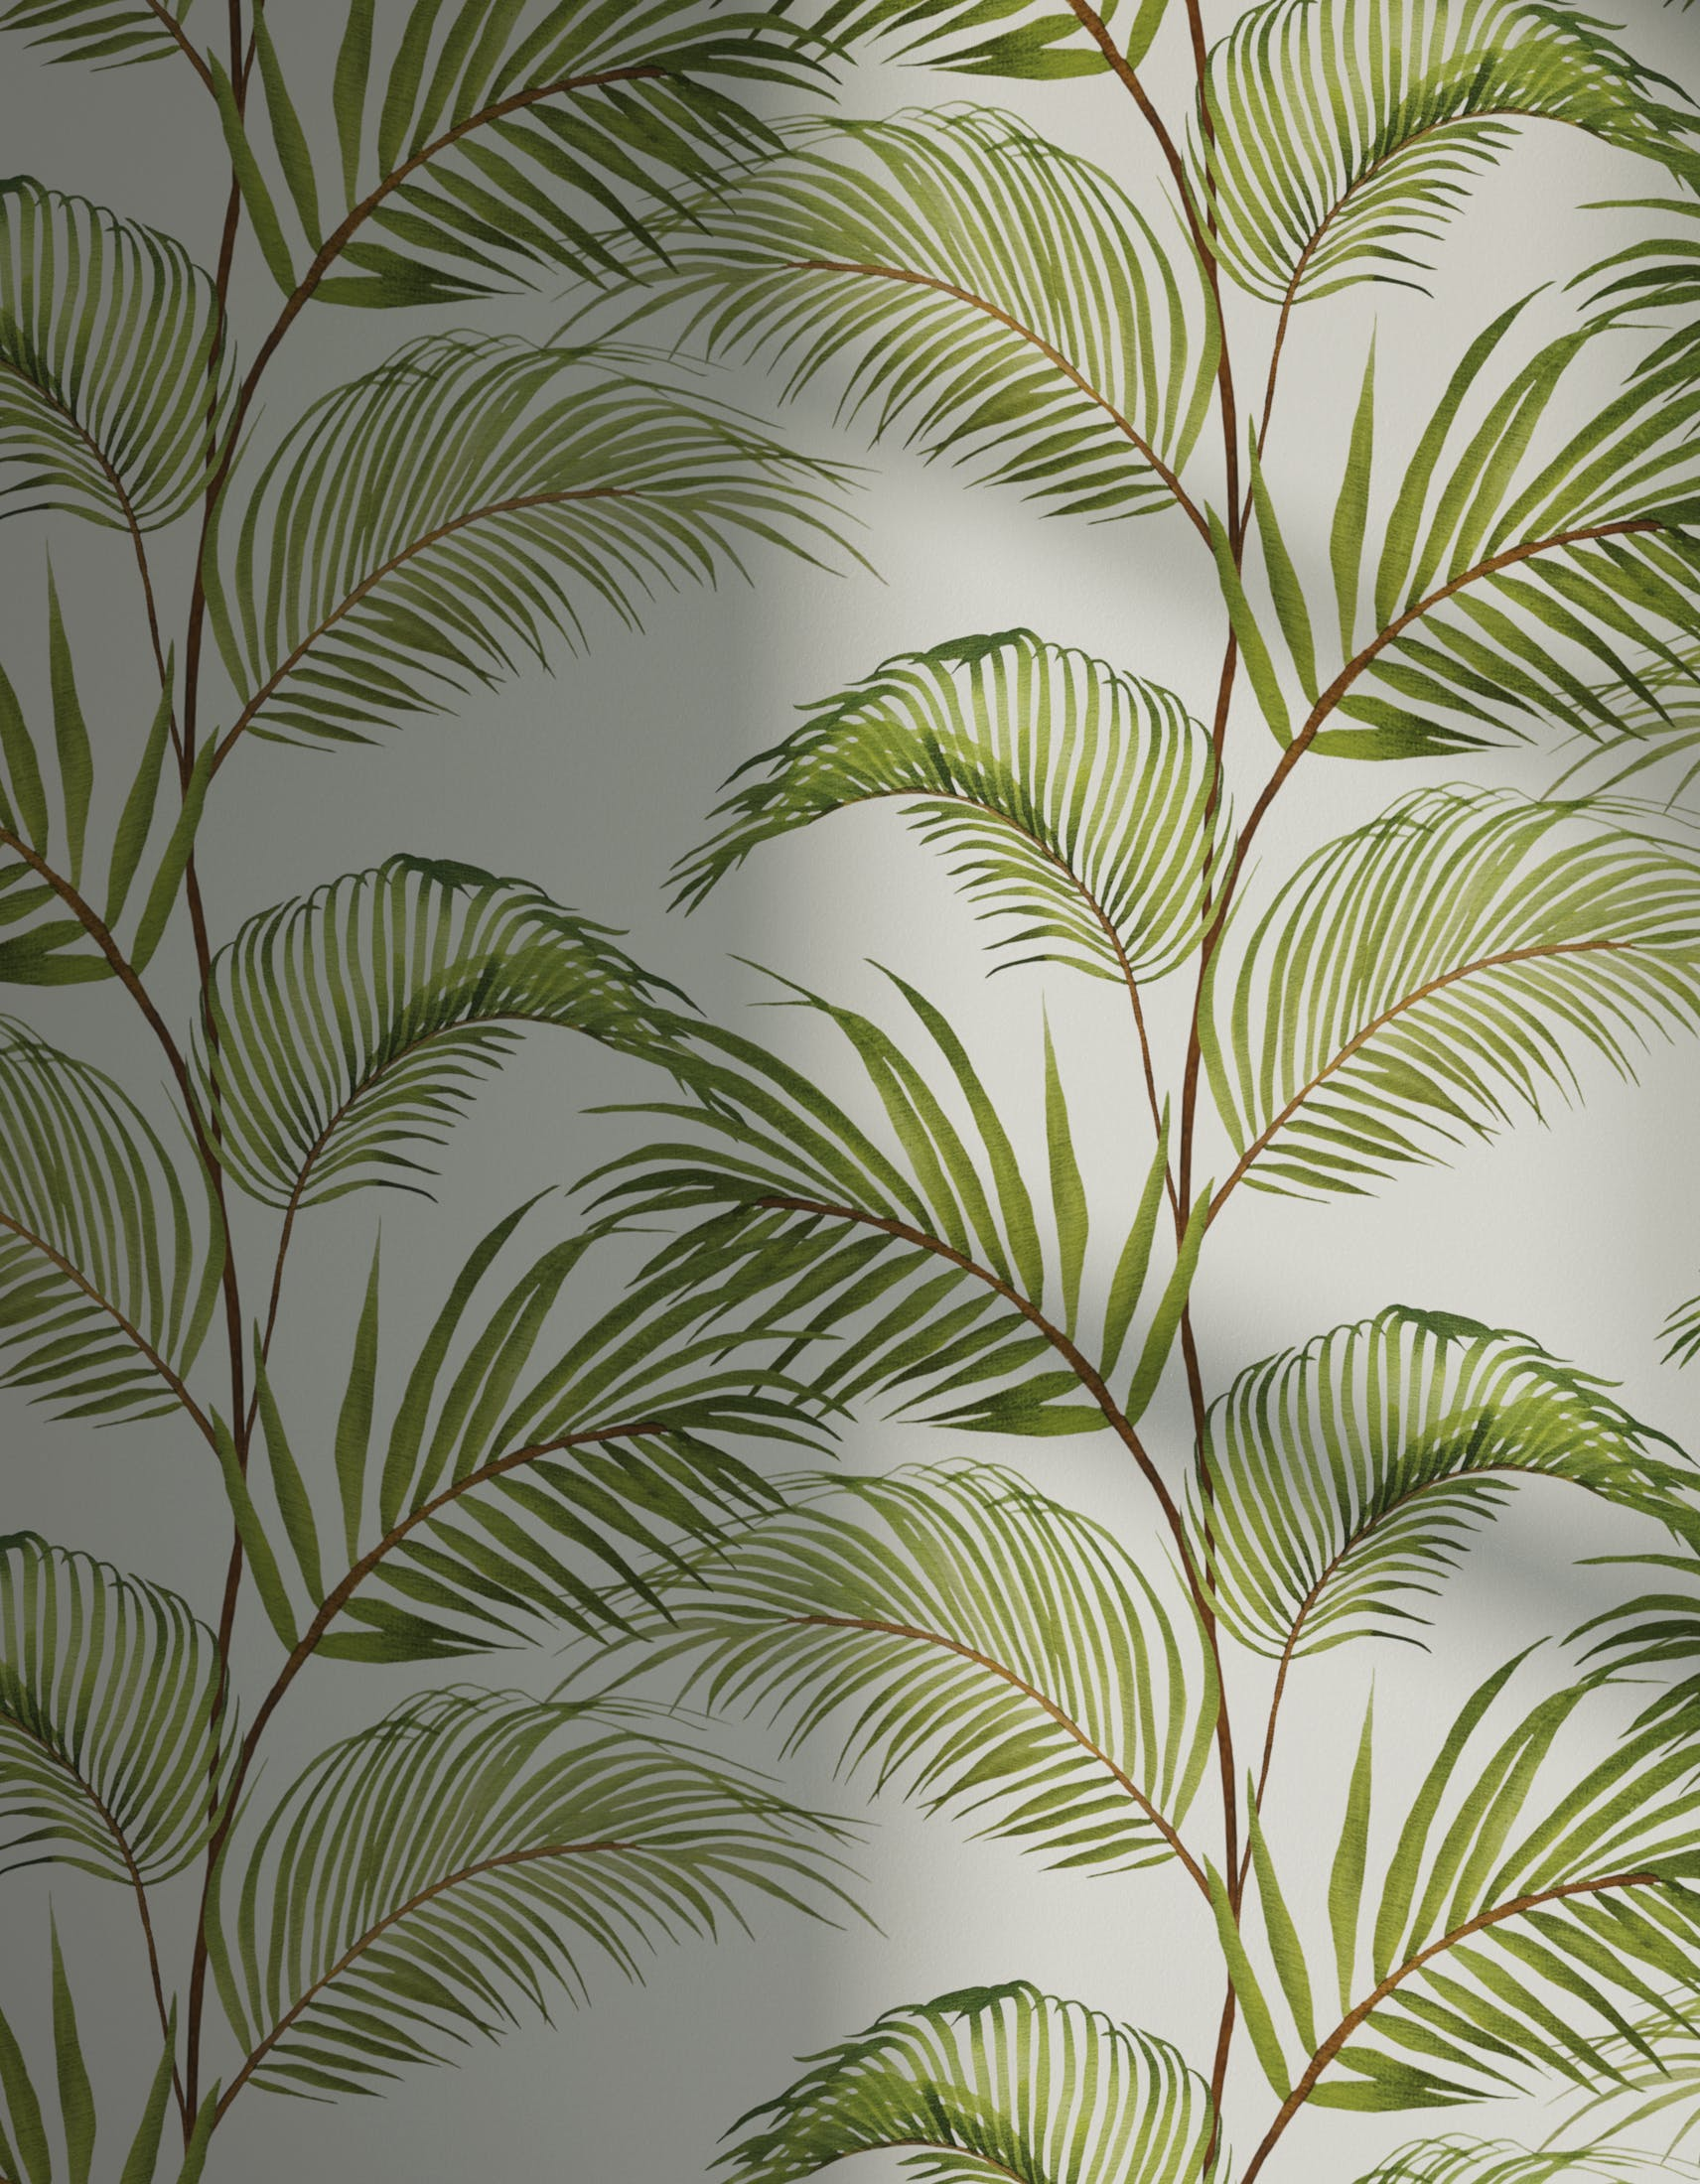 Lick x Belinda Bayley Jungle 03 wallpaper